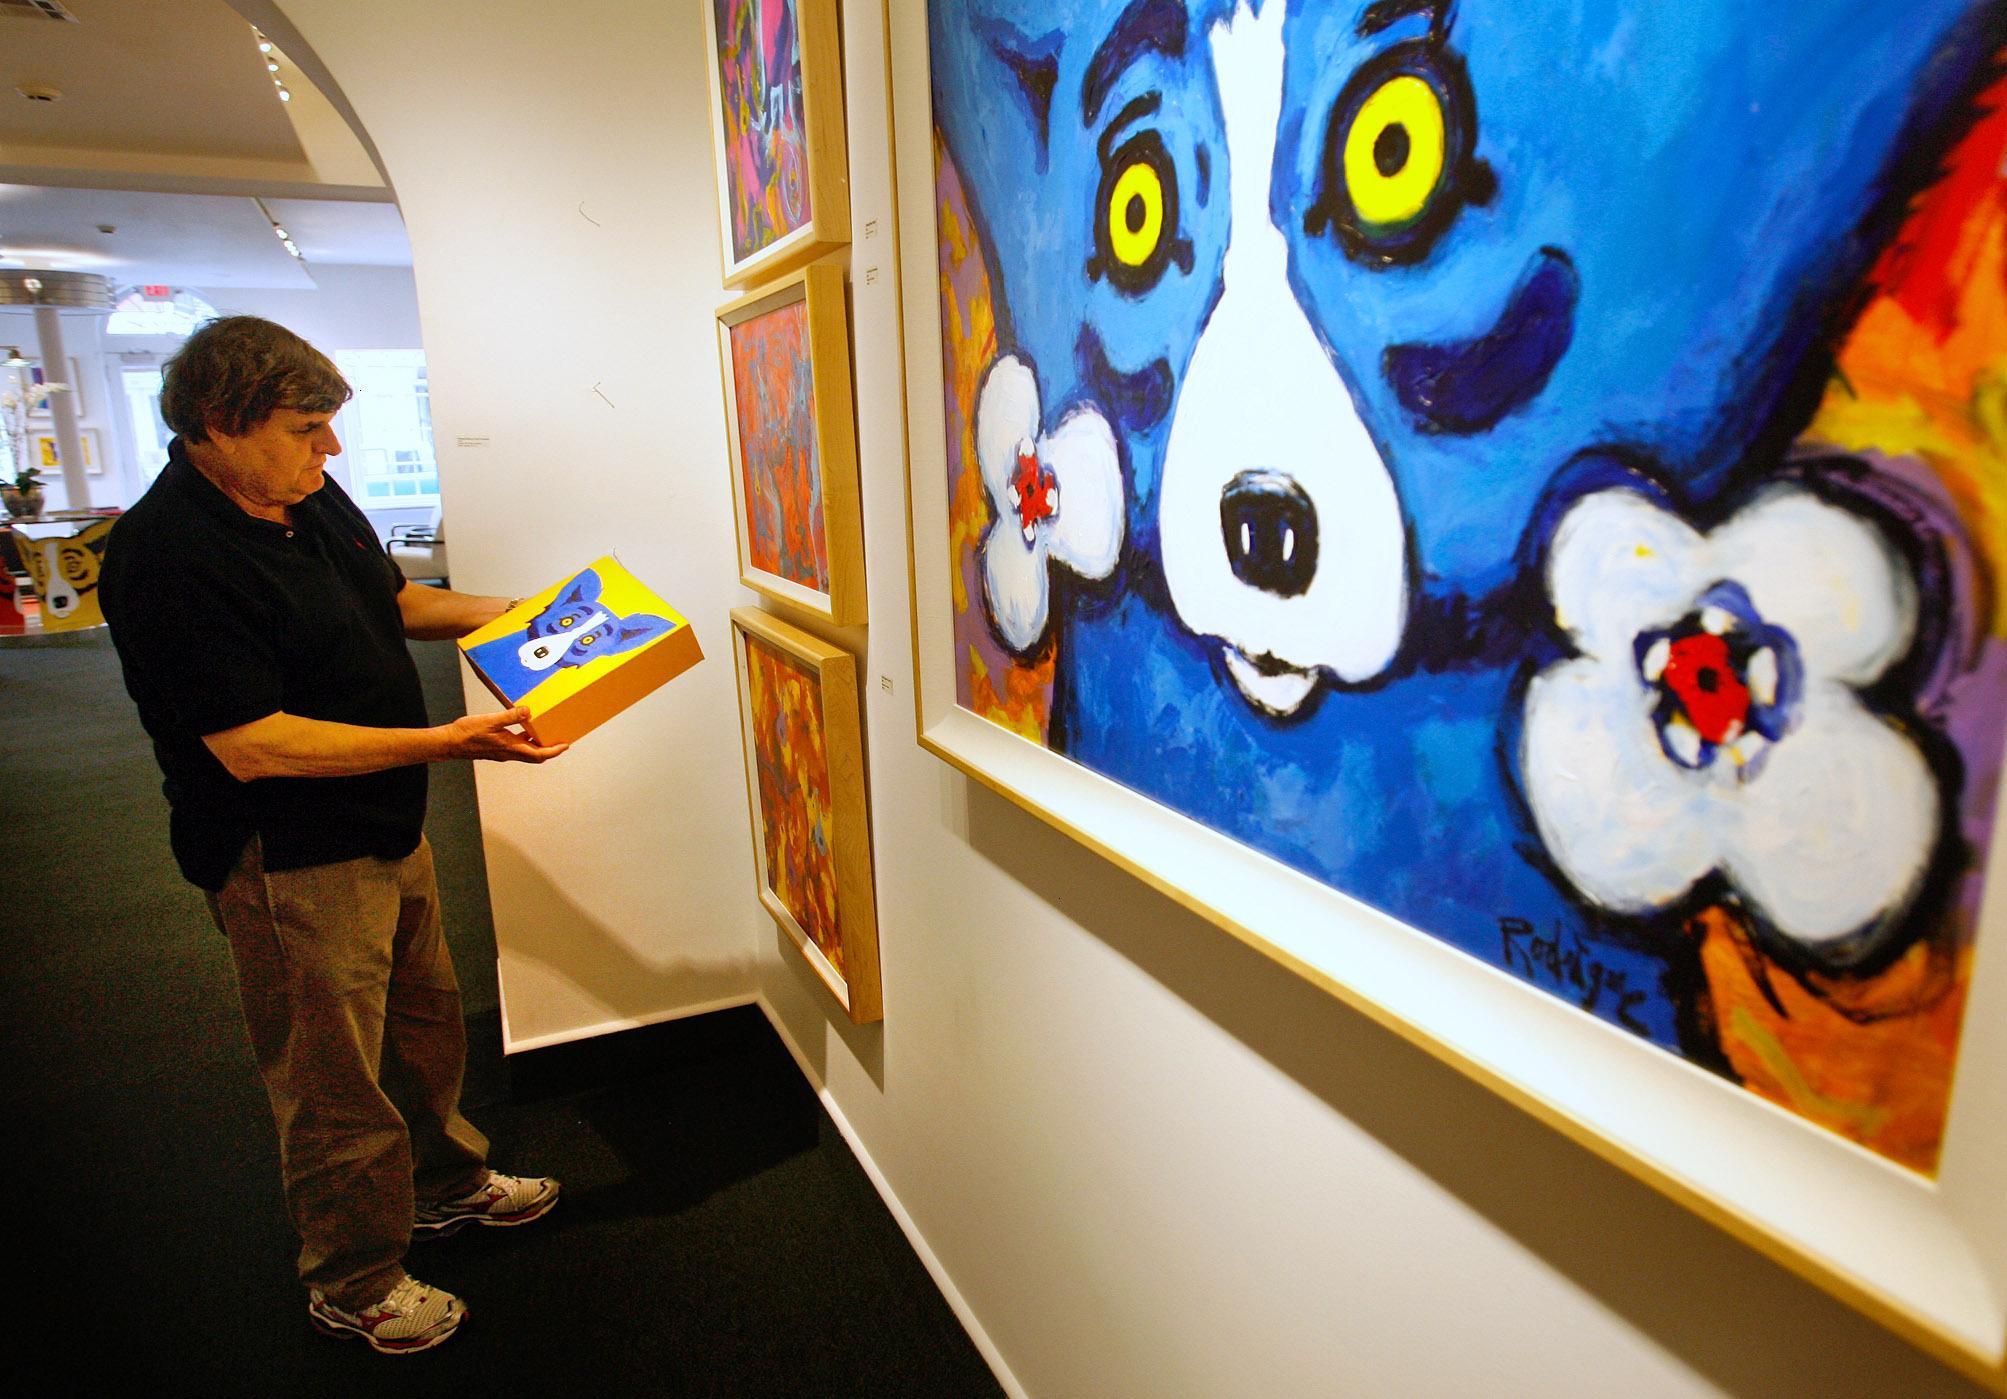 Painting Blue Dog 'blue Dog' Paintings Dies